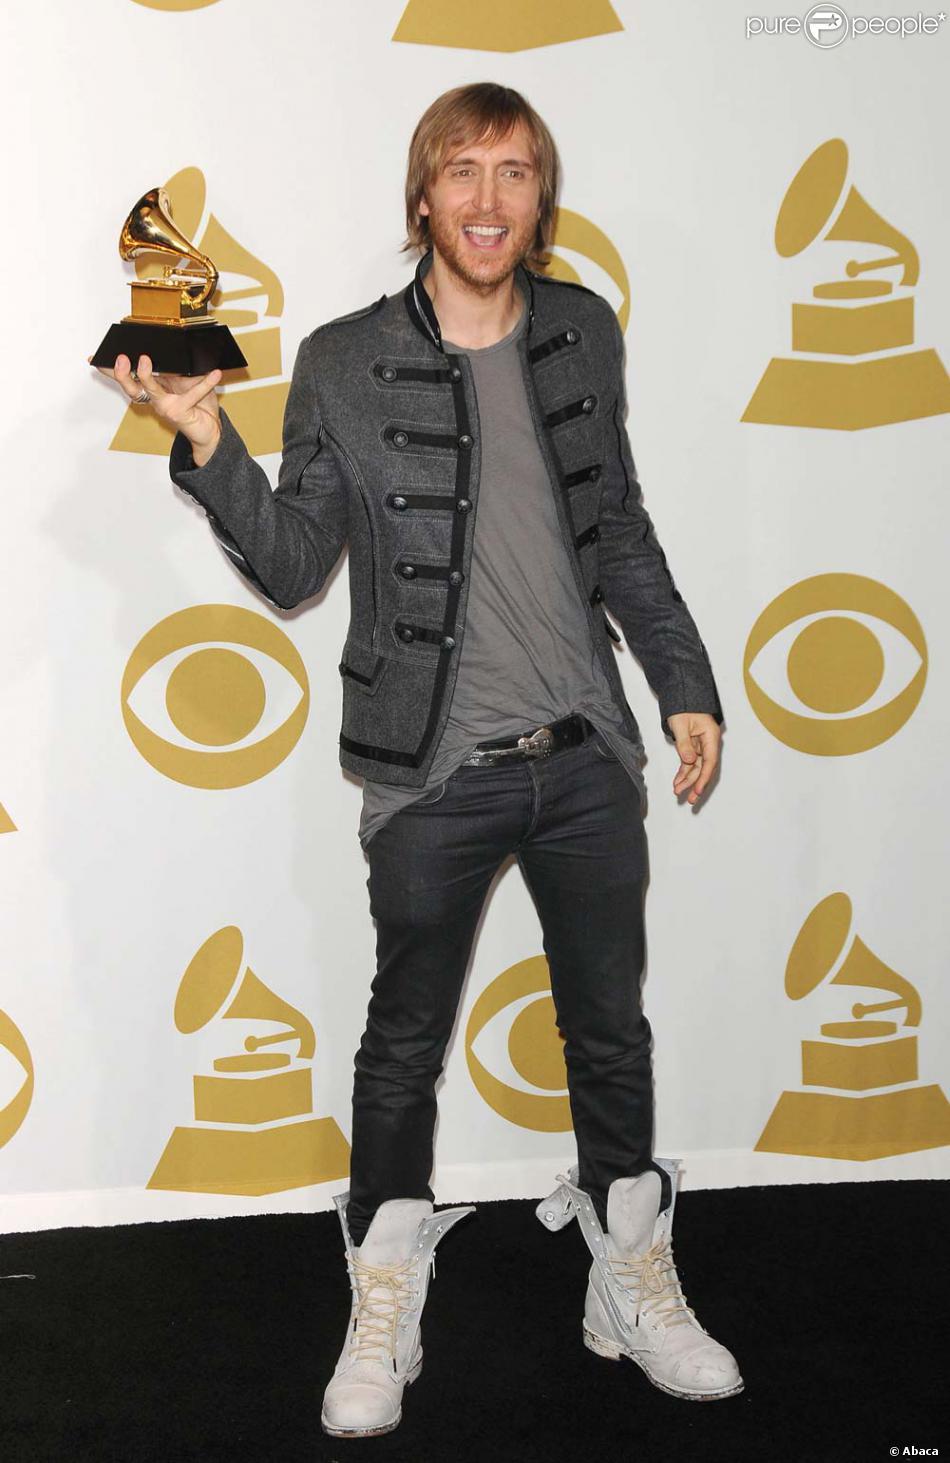 David Guetta aux Grammy Awards, Los Angeles, le 31 janvier 2010 - Purepeople